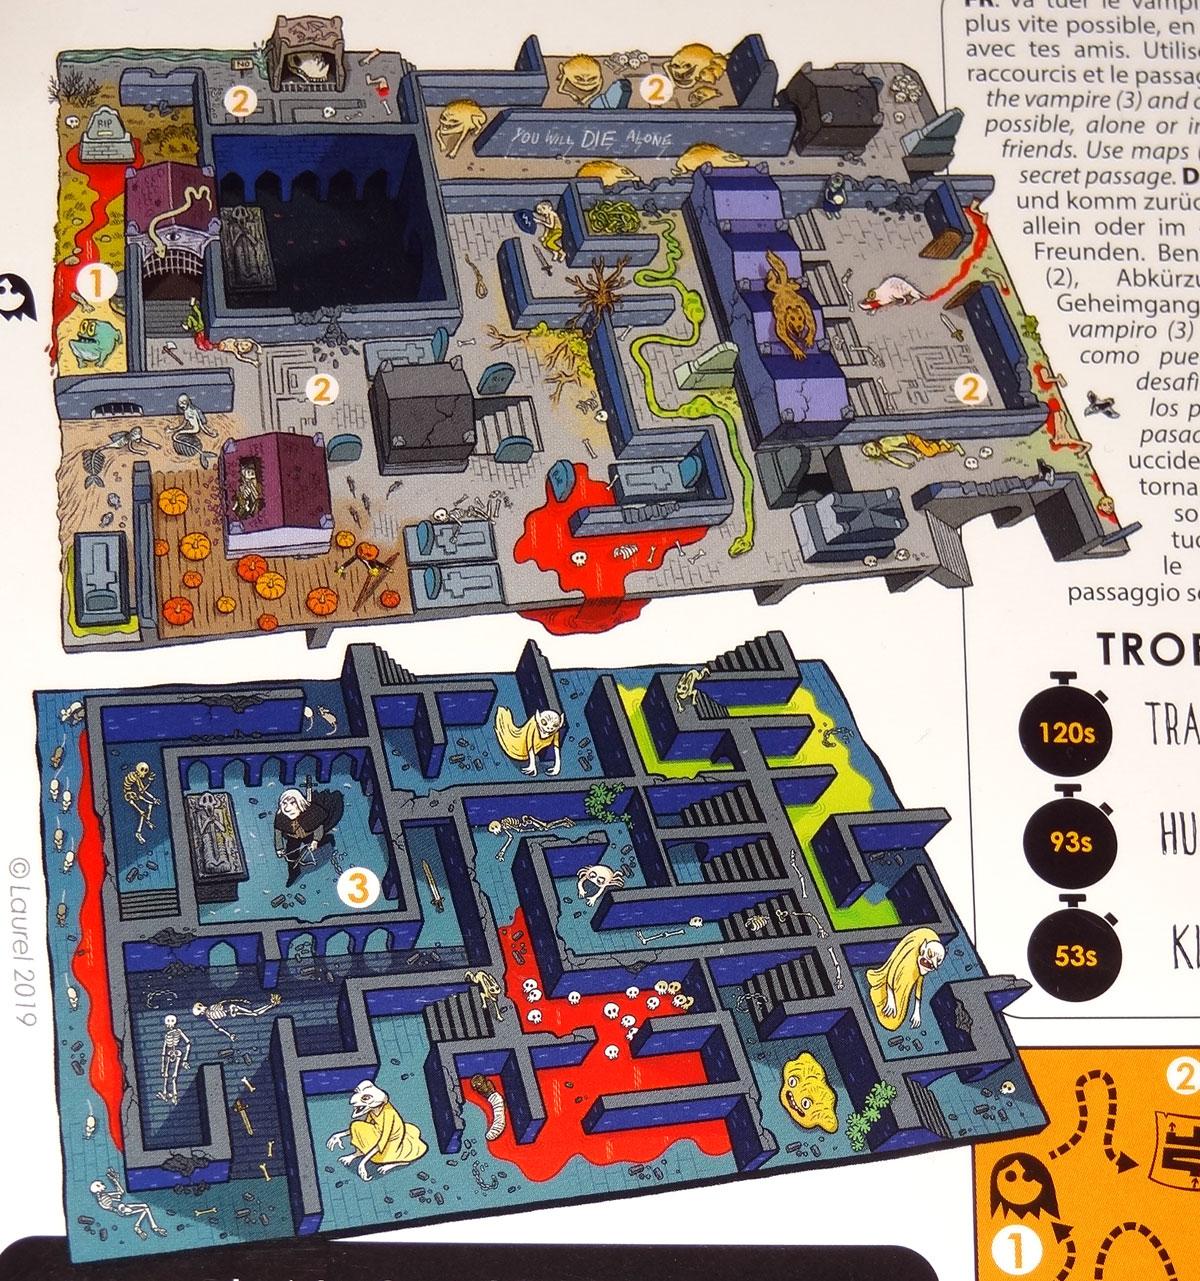 Legend: Crypt maze map